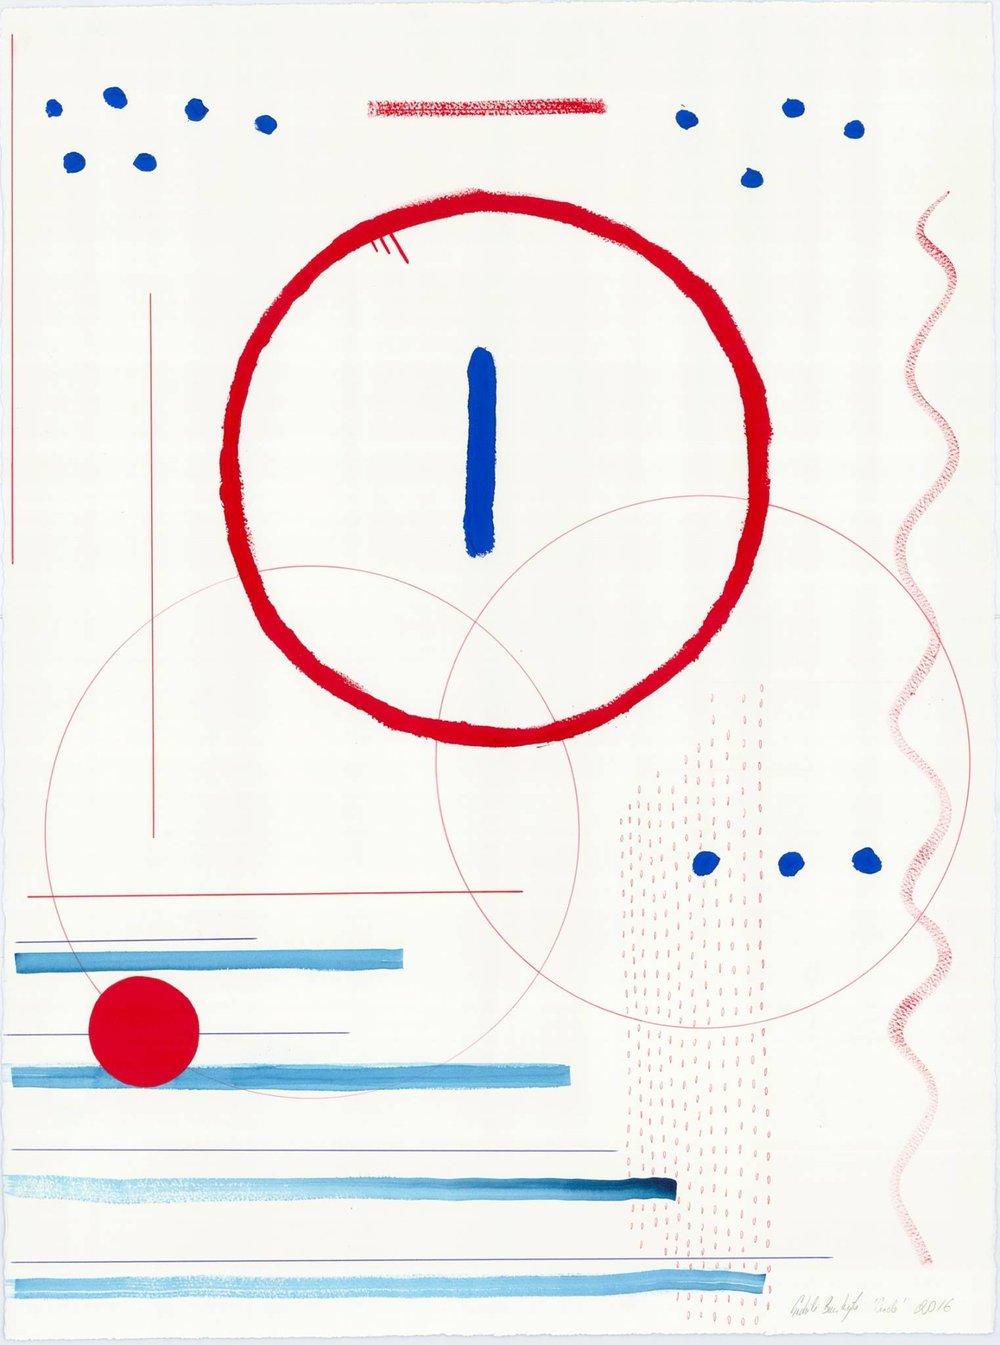 Circle Paper, ink, acrylic paint, pencil 75.5 x 56.5 cm, 2016